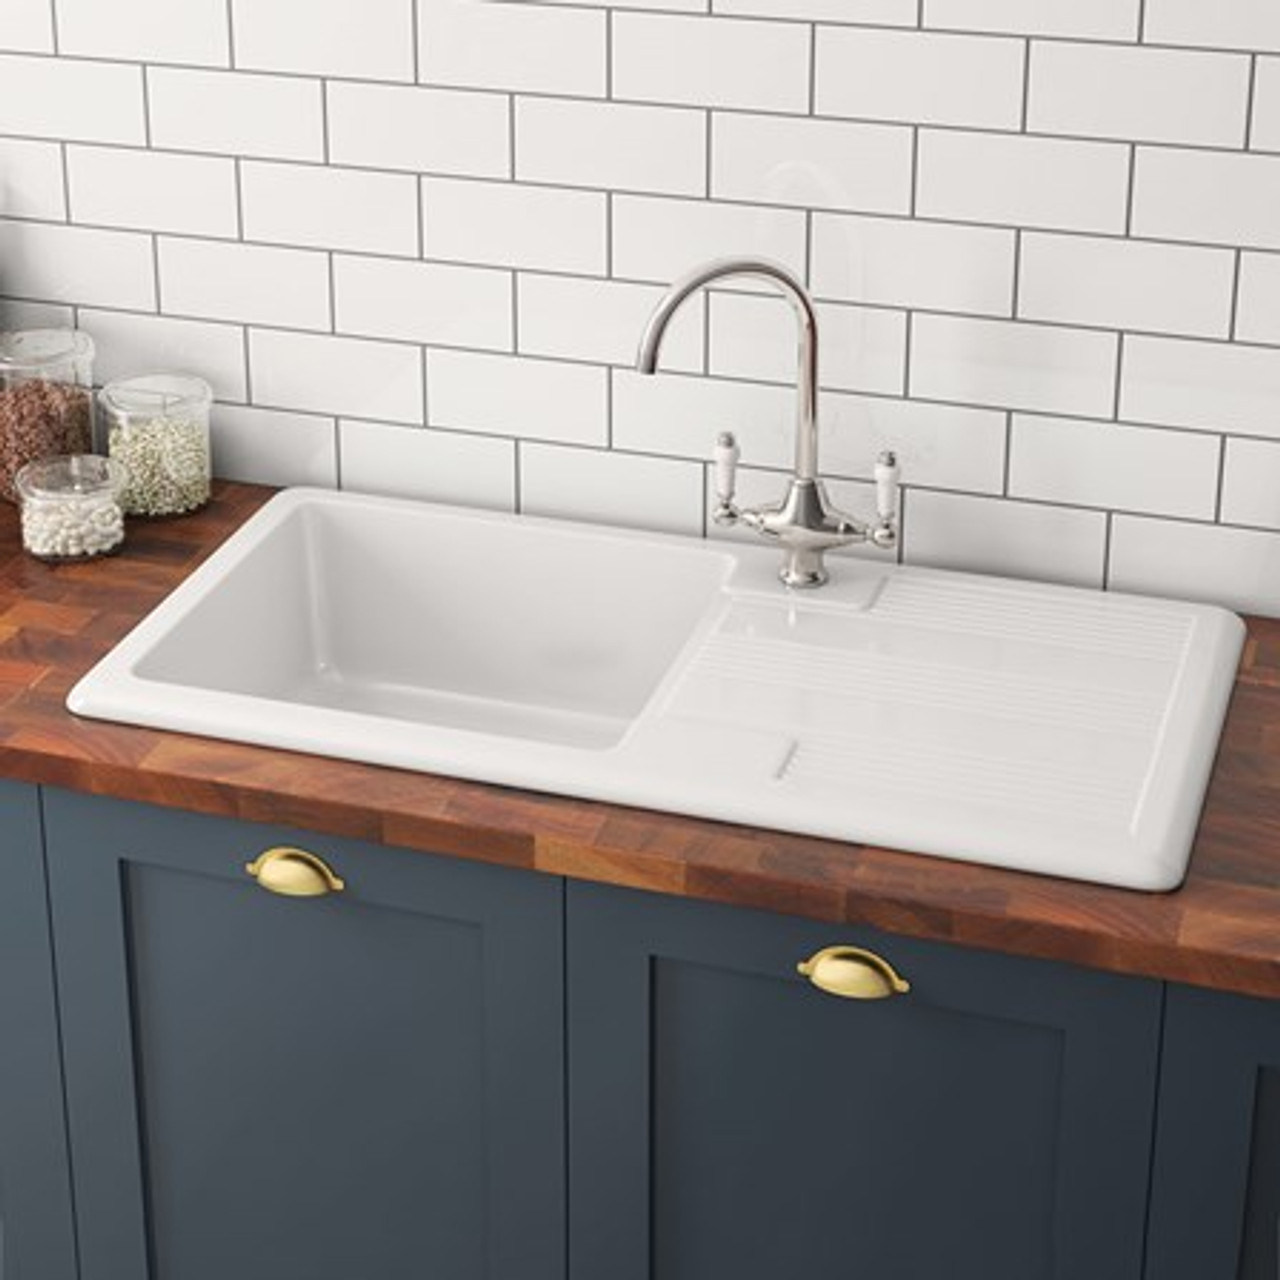 Brass traditional sinks rivendale ceramic kitchen sink sinks brass traditional sinks rivendale ceramic kitchen sink workwithnaturefo